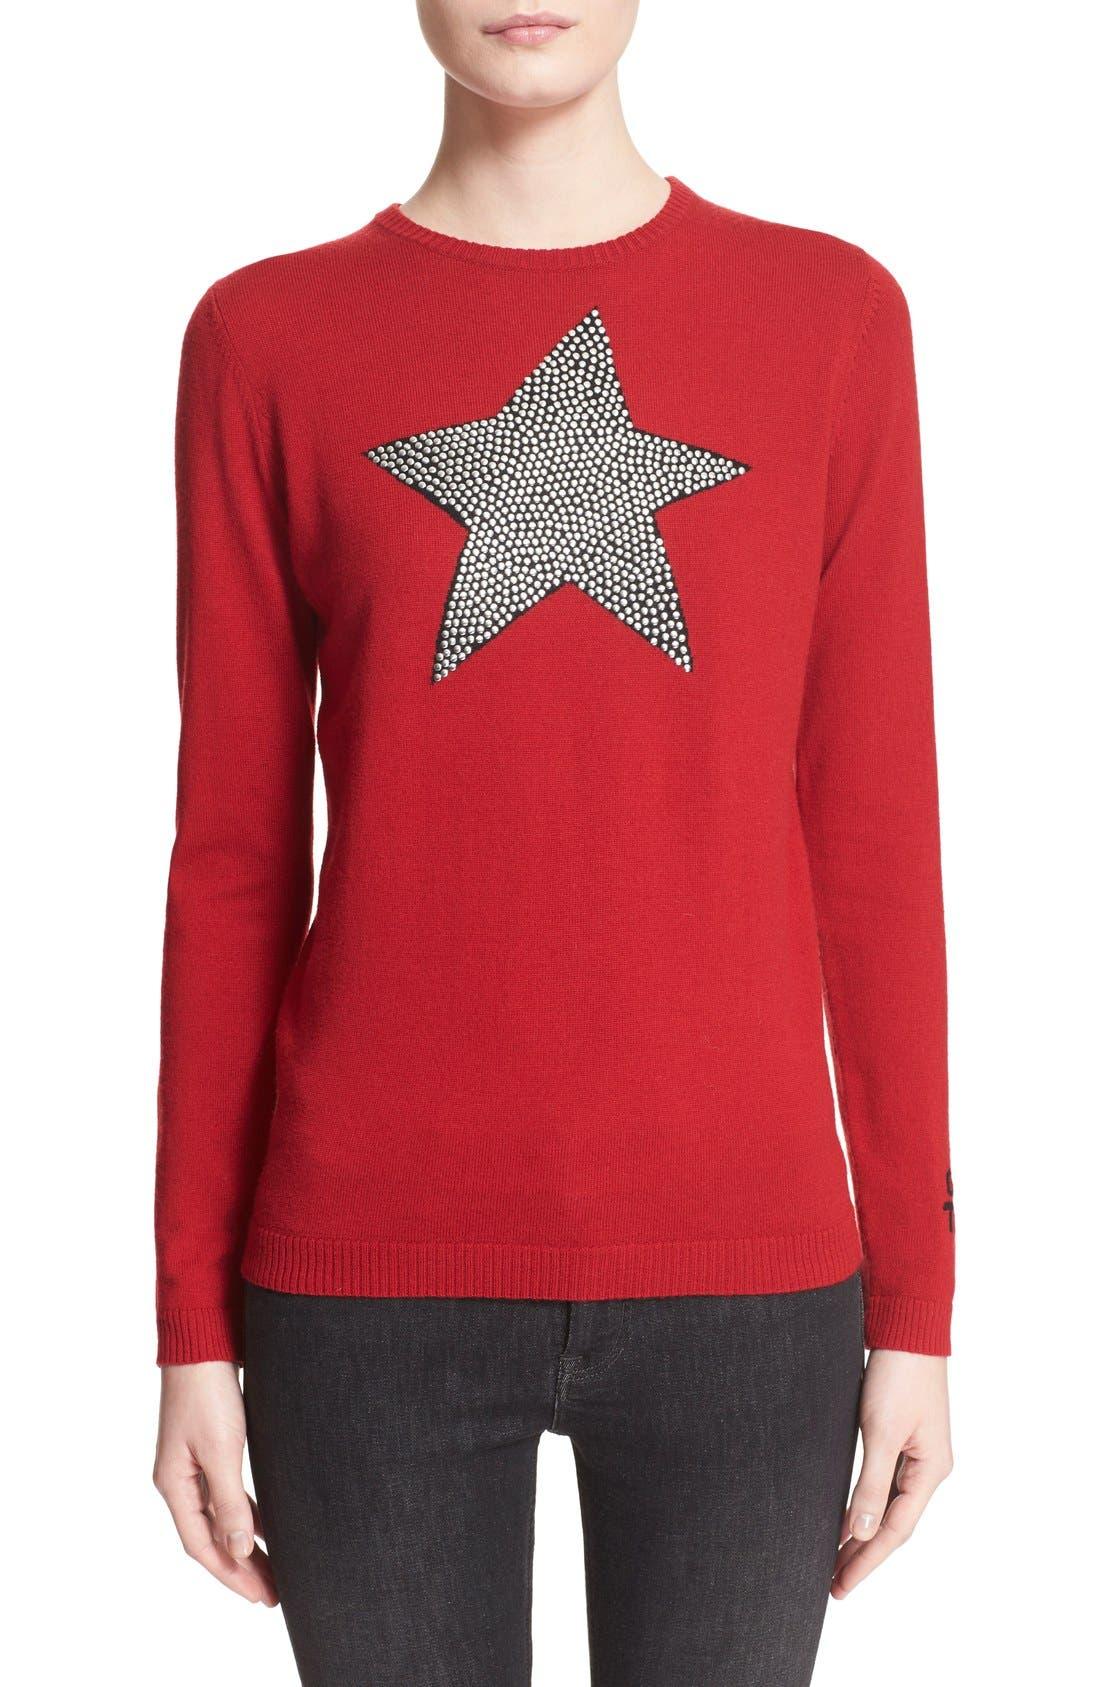 Alternate Image 1 Selected - Bella Freud 'Star Studded' Crewneck Wool Sweater